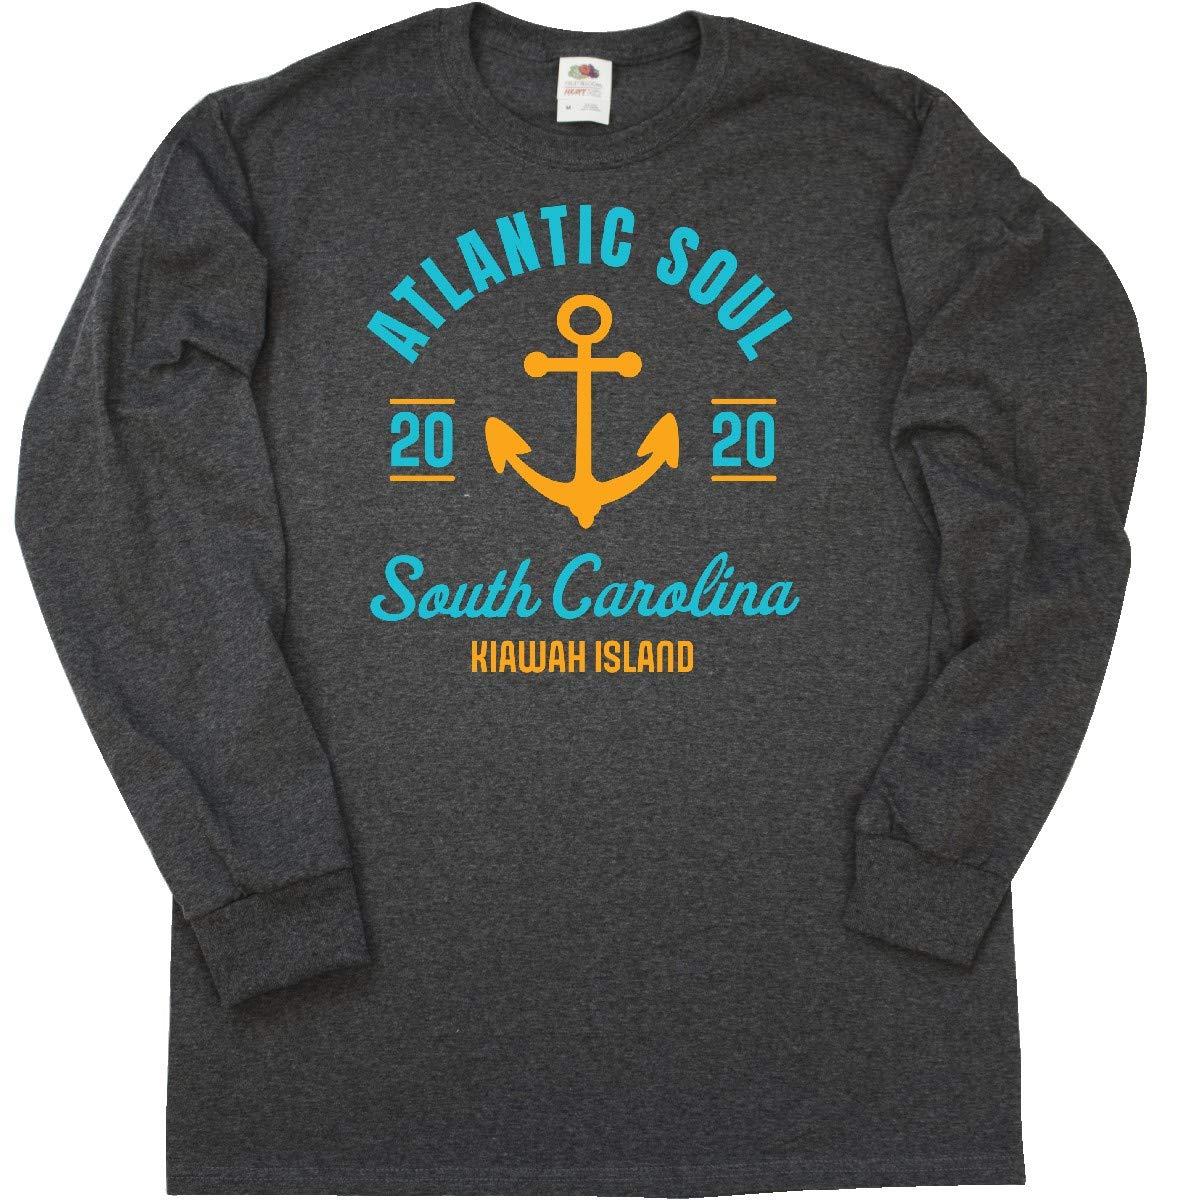 Inktastic Atlantic Soul South Carolina Kiawah Island 2020 Shirts